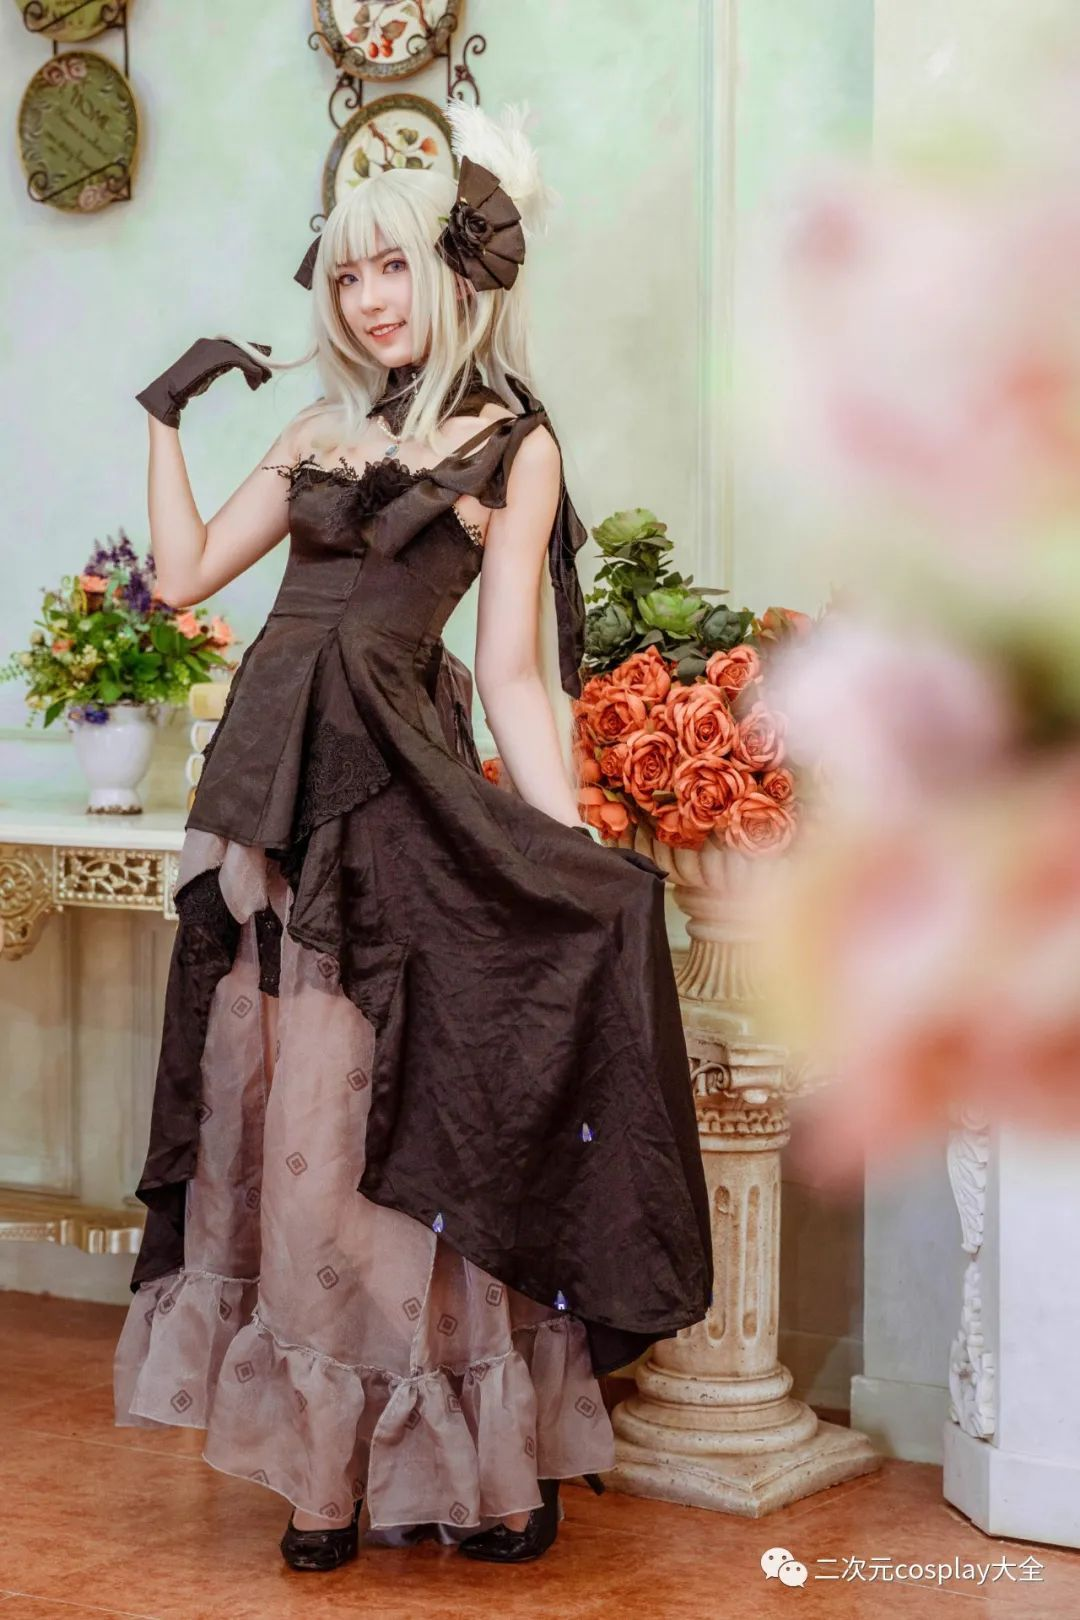 cosplay – FGO玛丽安托瓦内特,优雅俊美,笑靥如花的美少女 - [leimu486.com] No.10